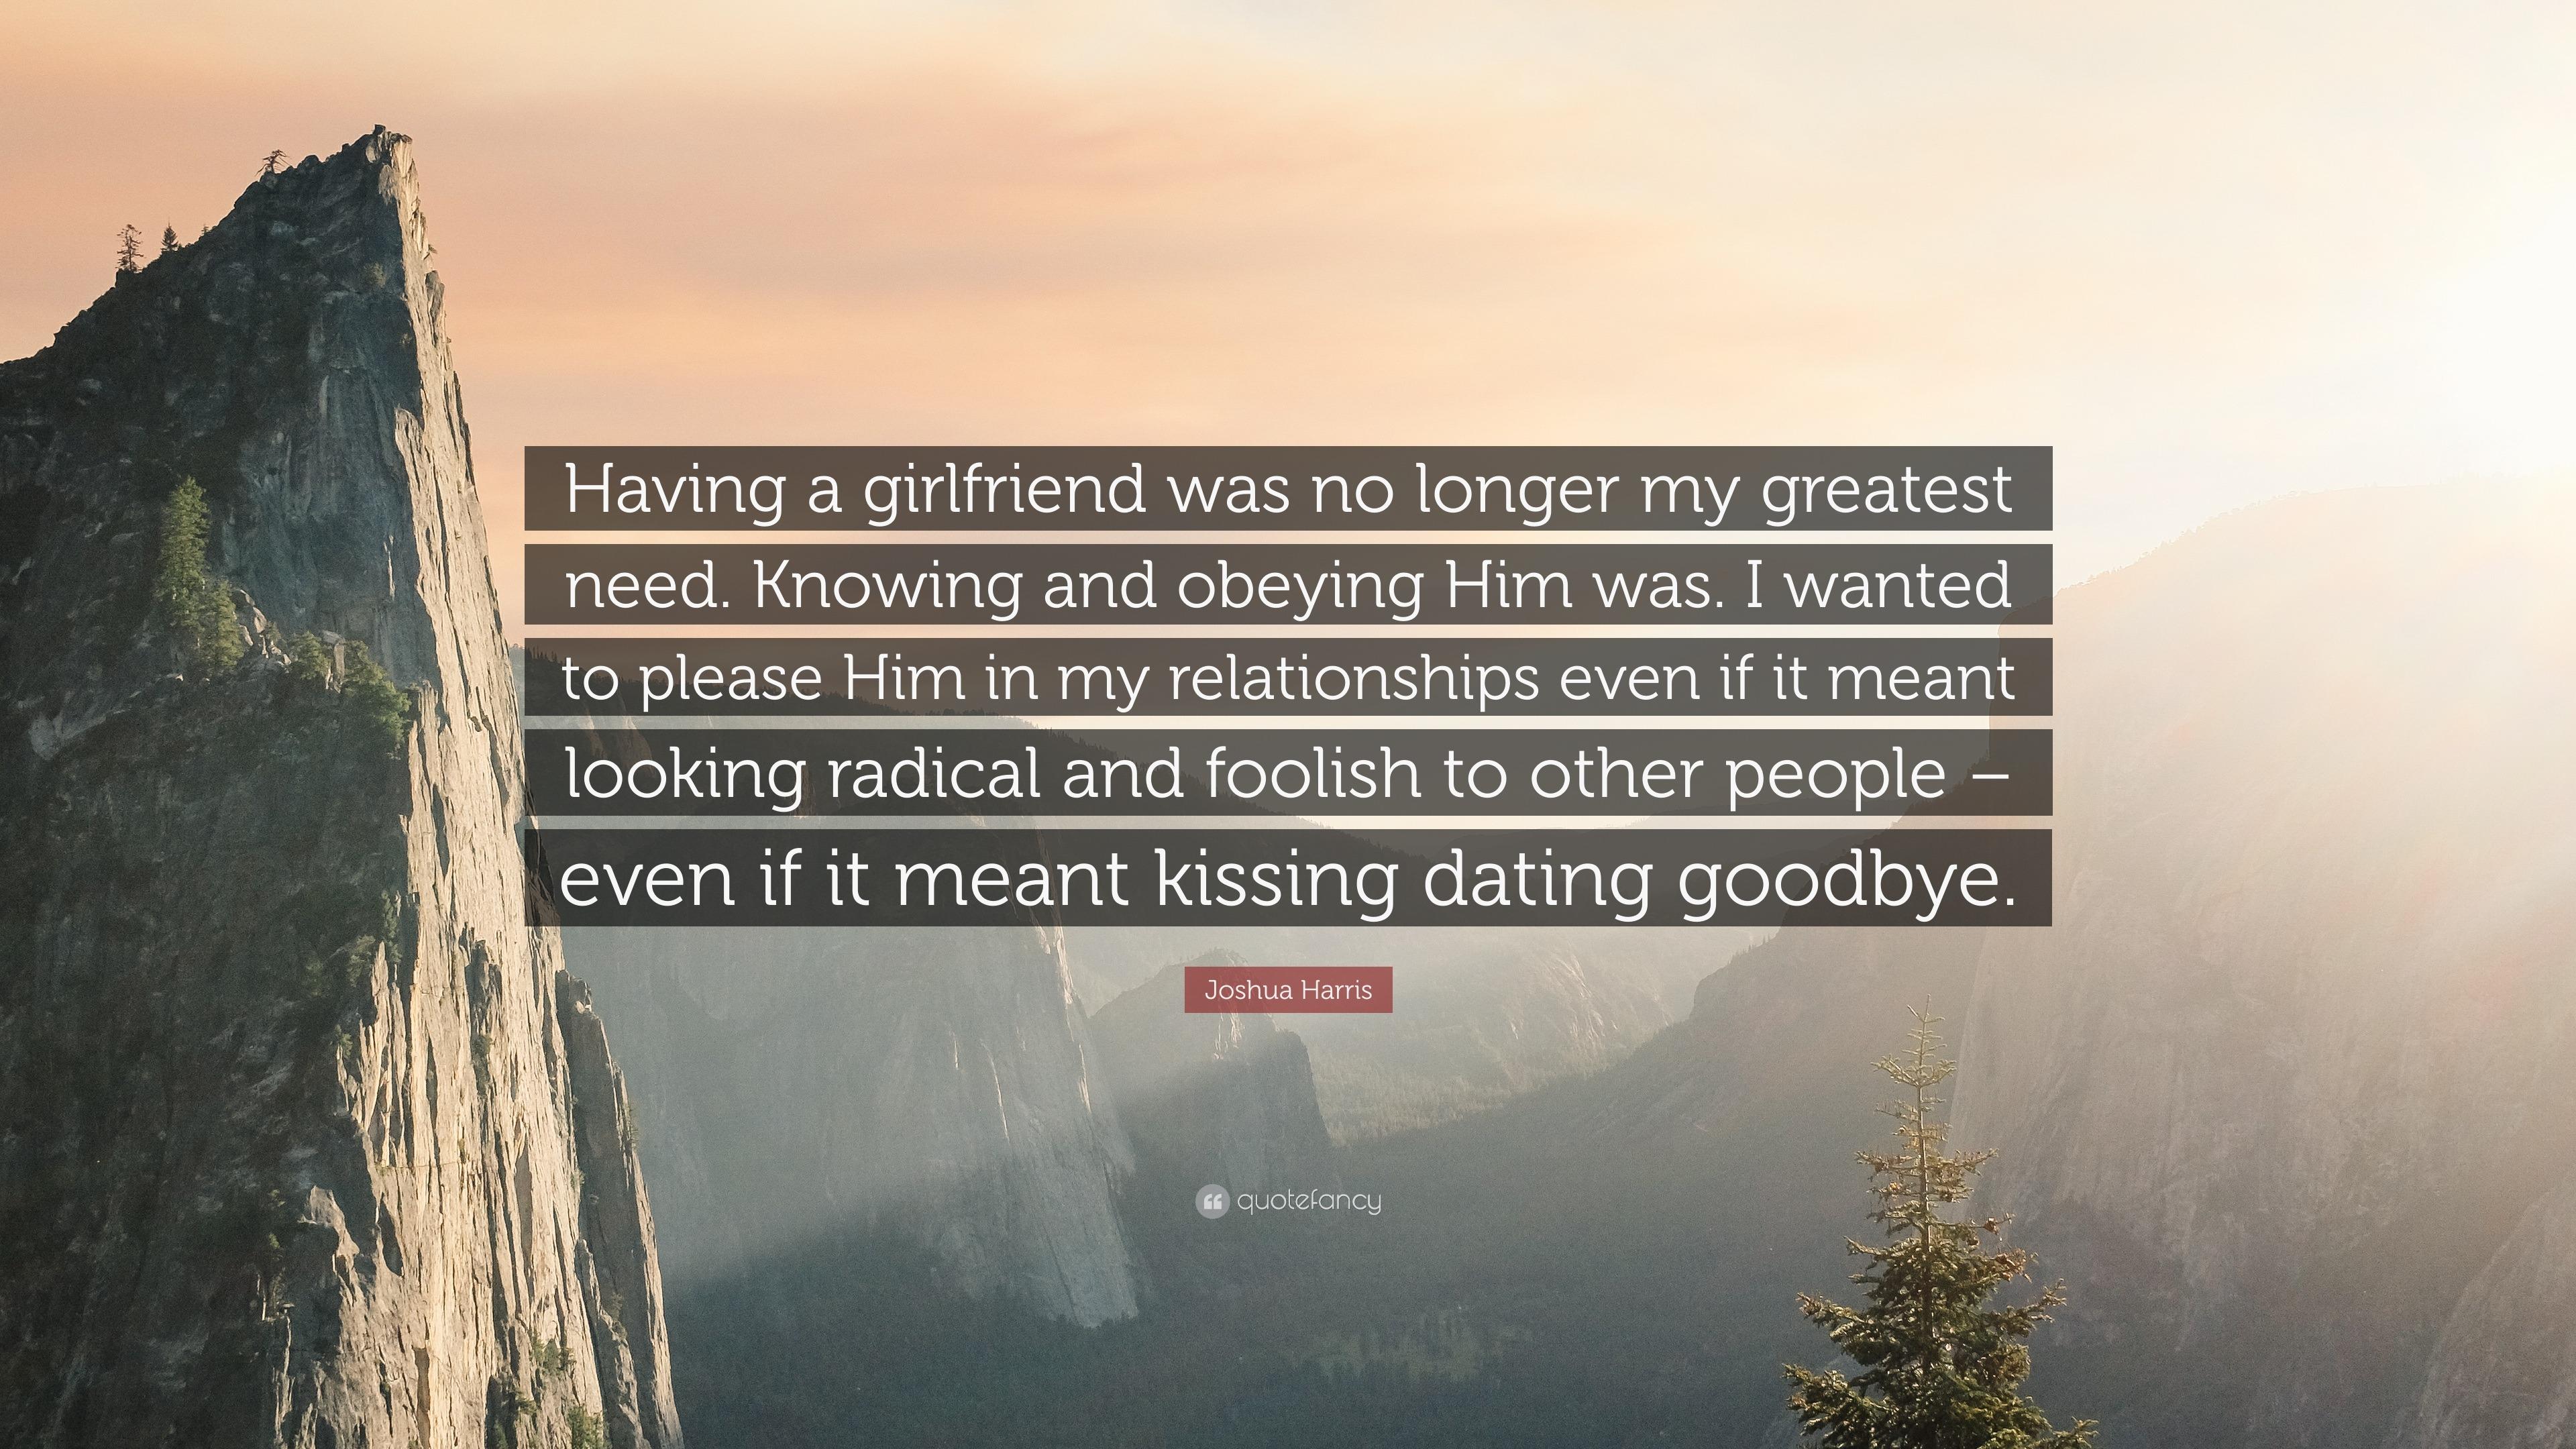 from Beckett kissing dating goodbye joshua harris